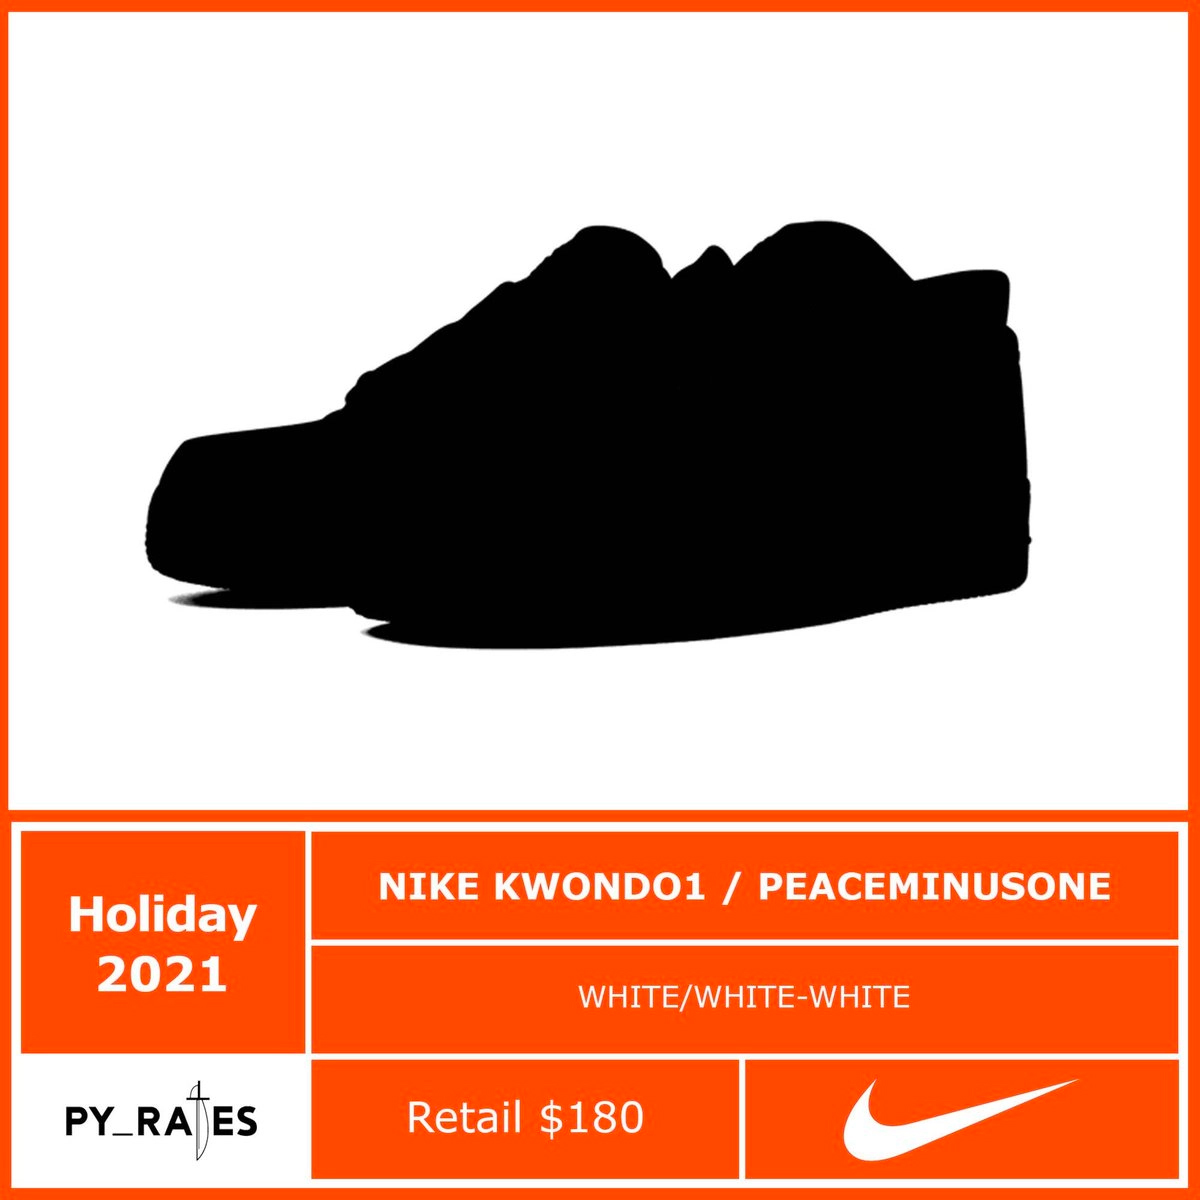 PEACEMINUSONE,Air Force 1 Low,  权志龙 x Nike 全新联名曝光!这次还是 GD 专属鞋款!